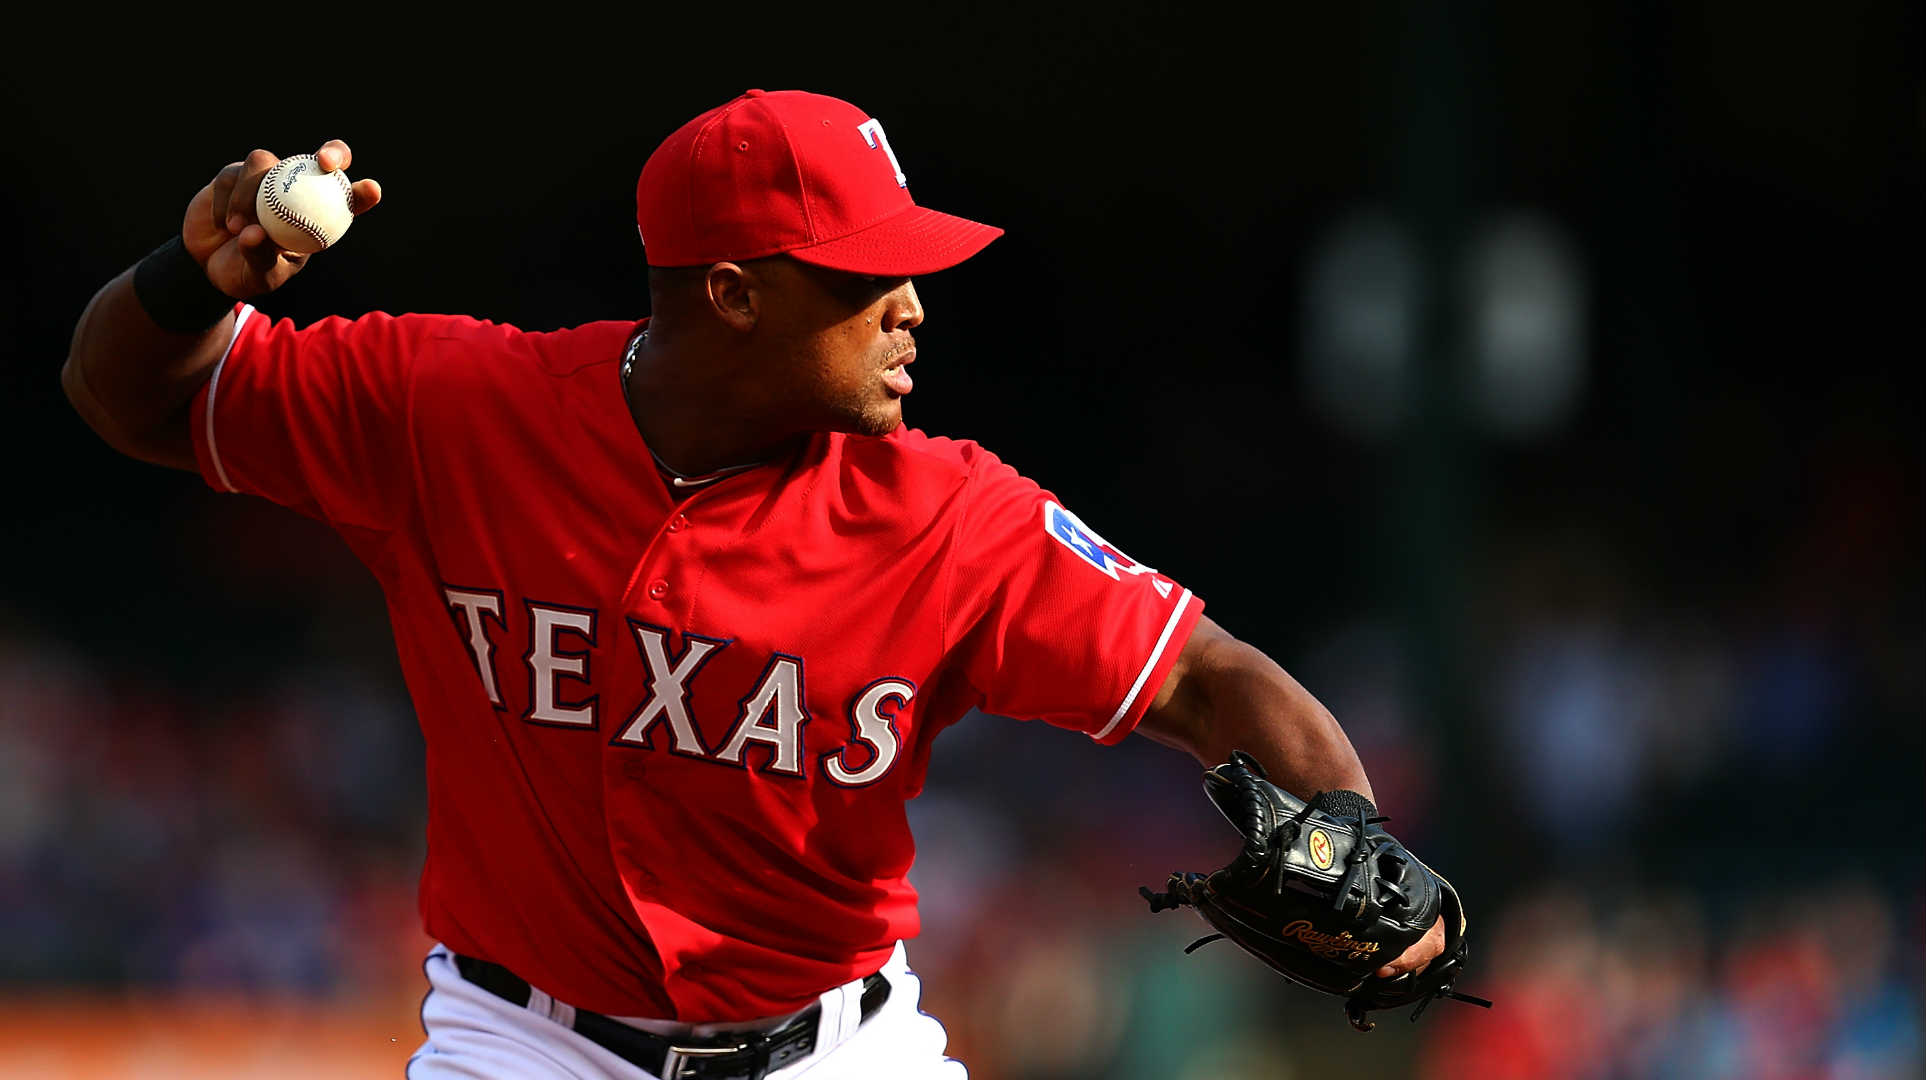 Rangers-third-baseman-adrian-beltre_ap86m4jyqnte15yrwade3ybgt